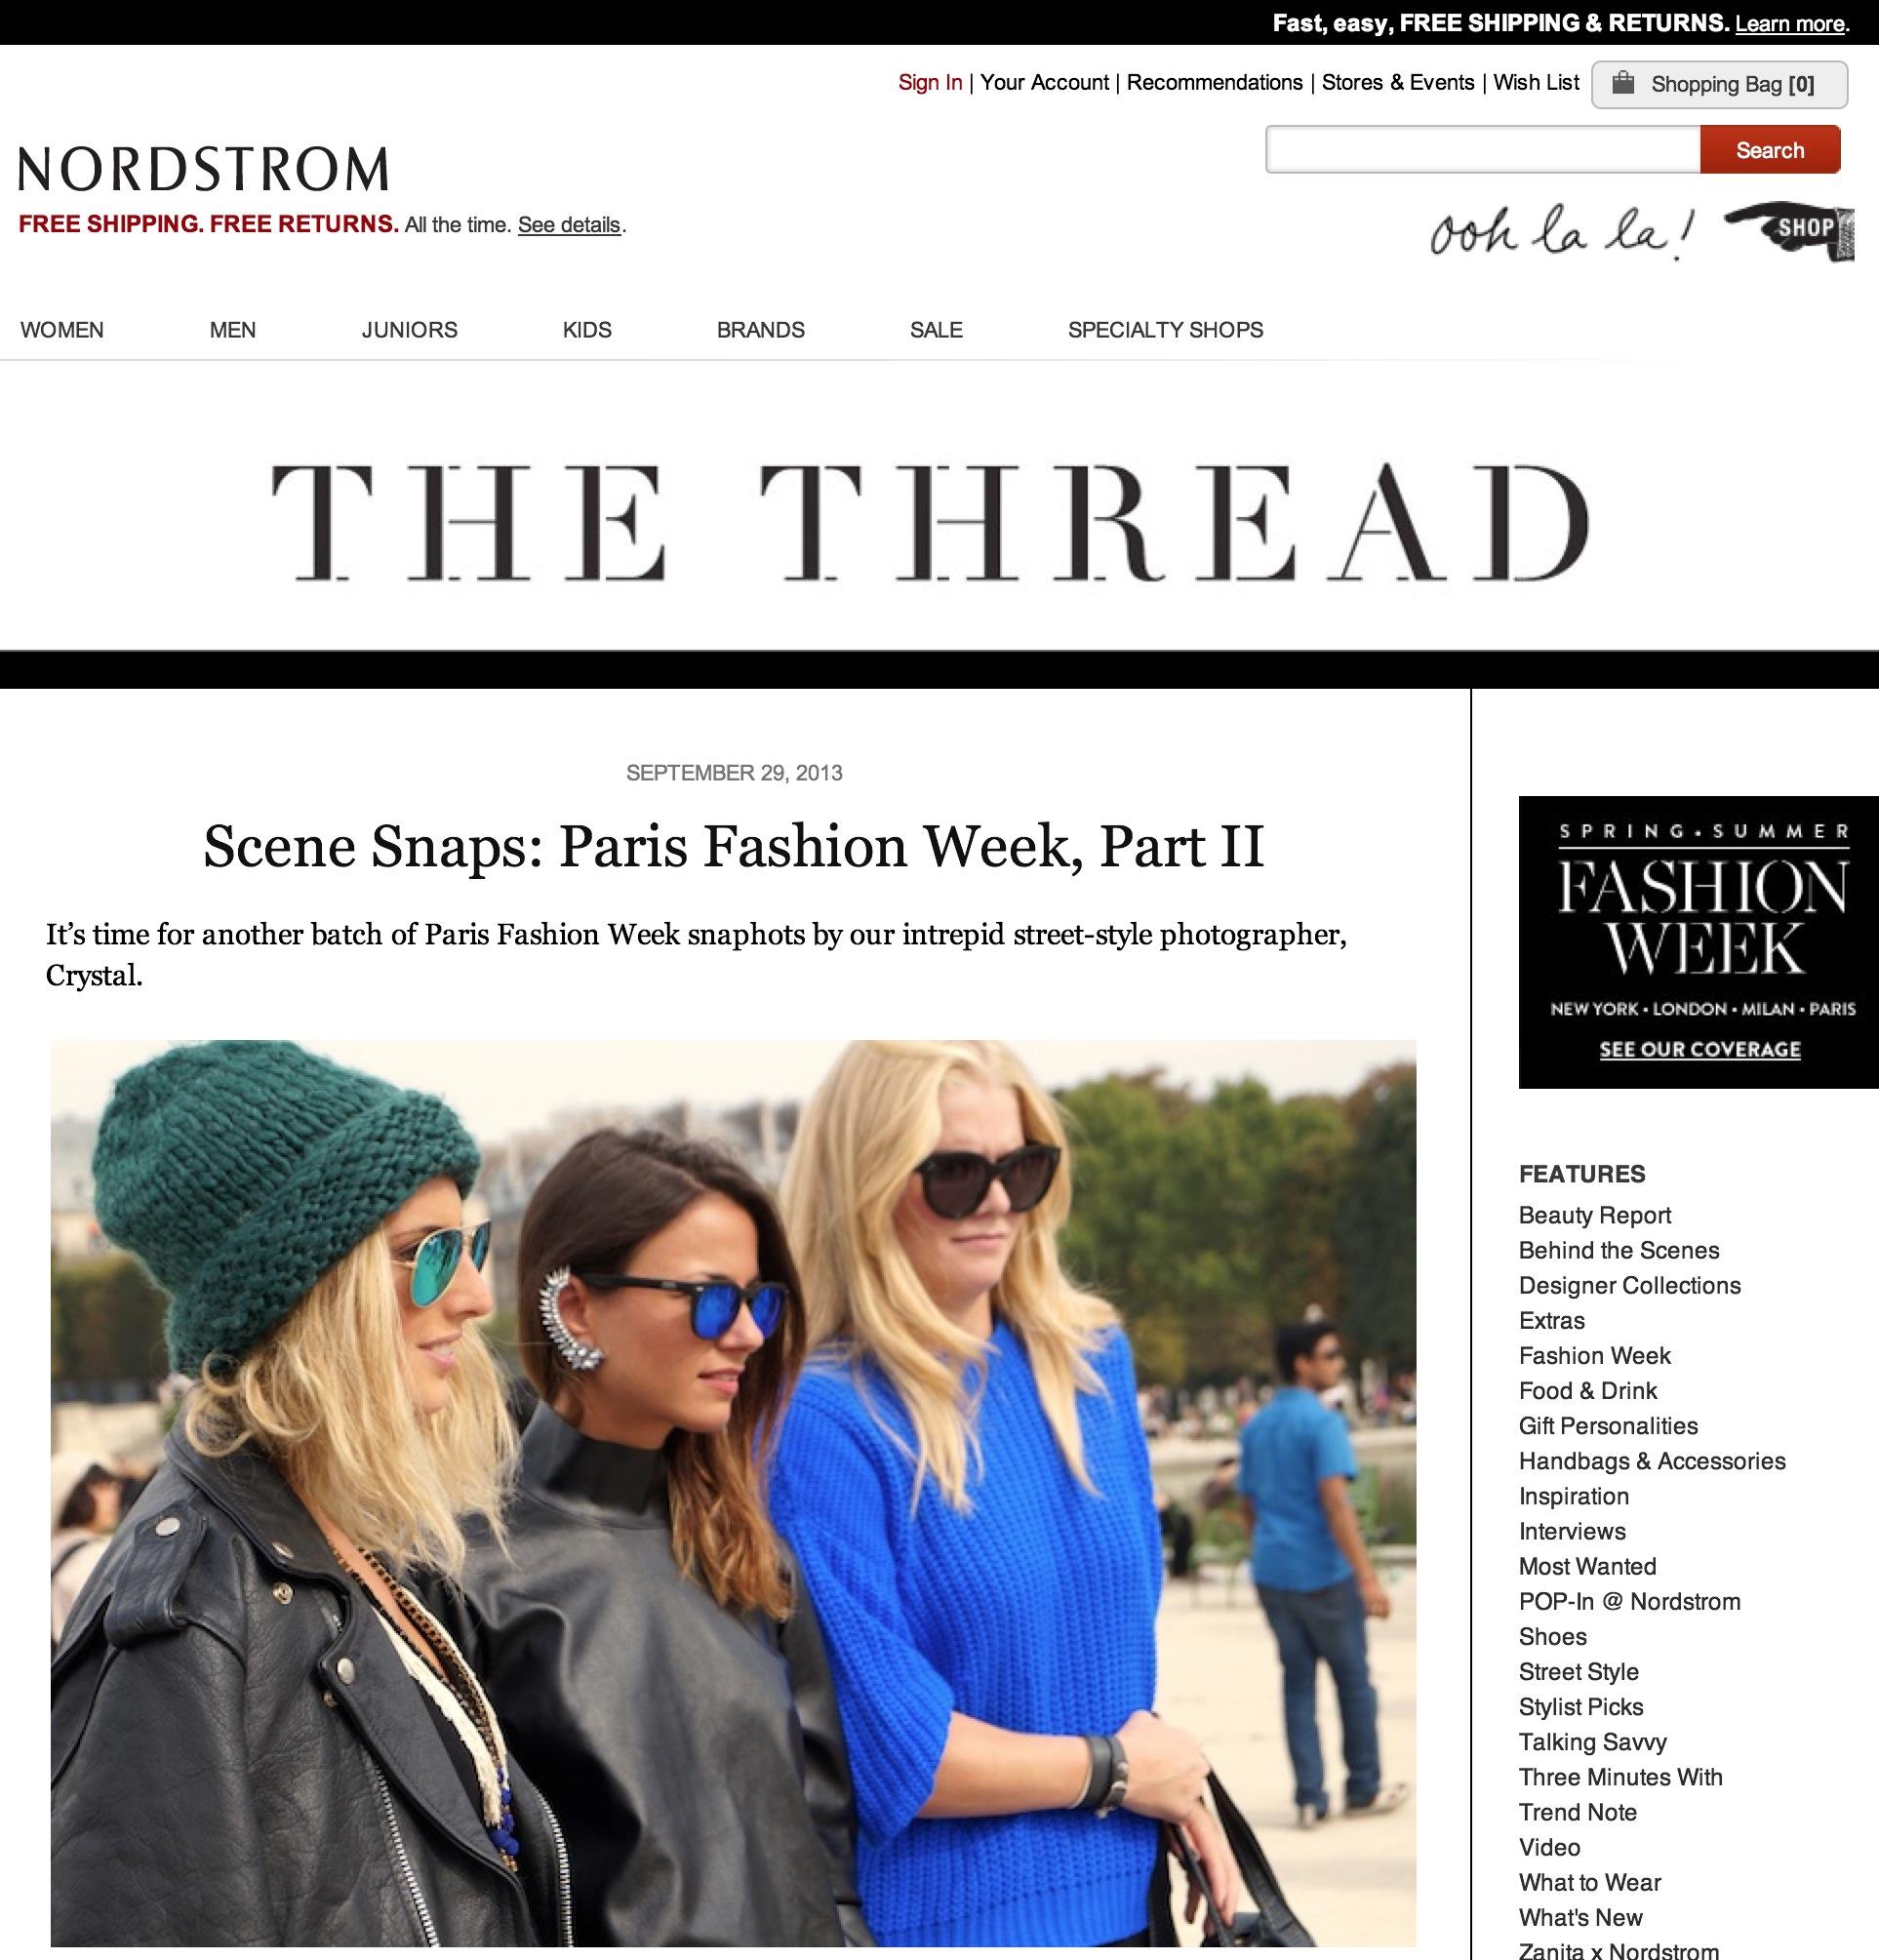 Nordstrom blog   Paris fashion week  Sept 2013